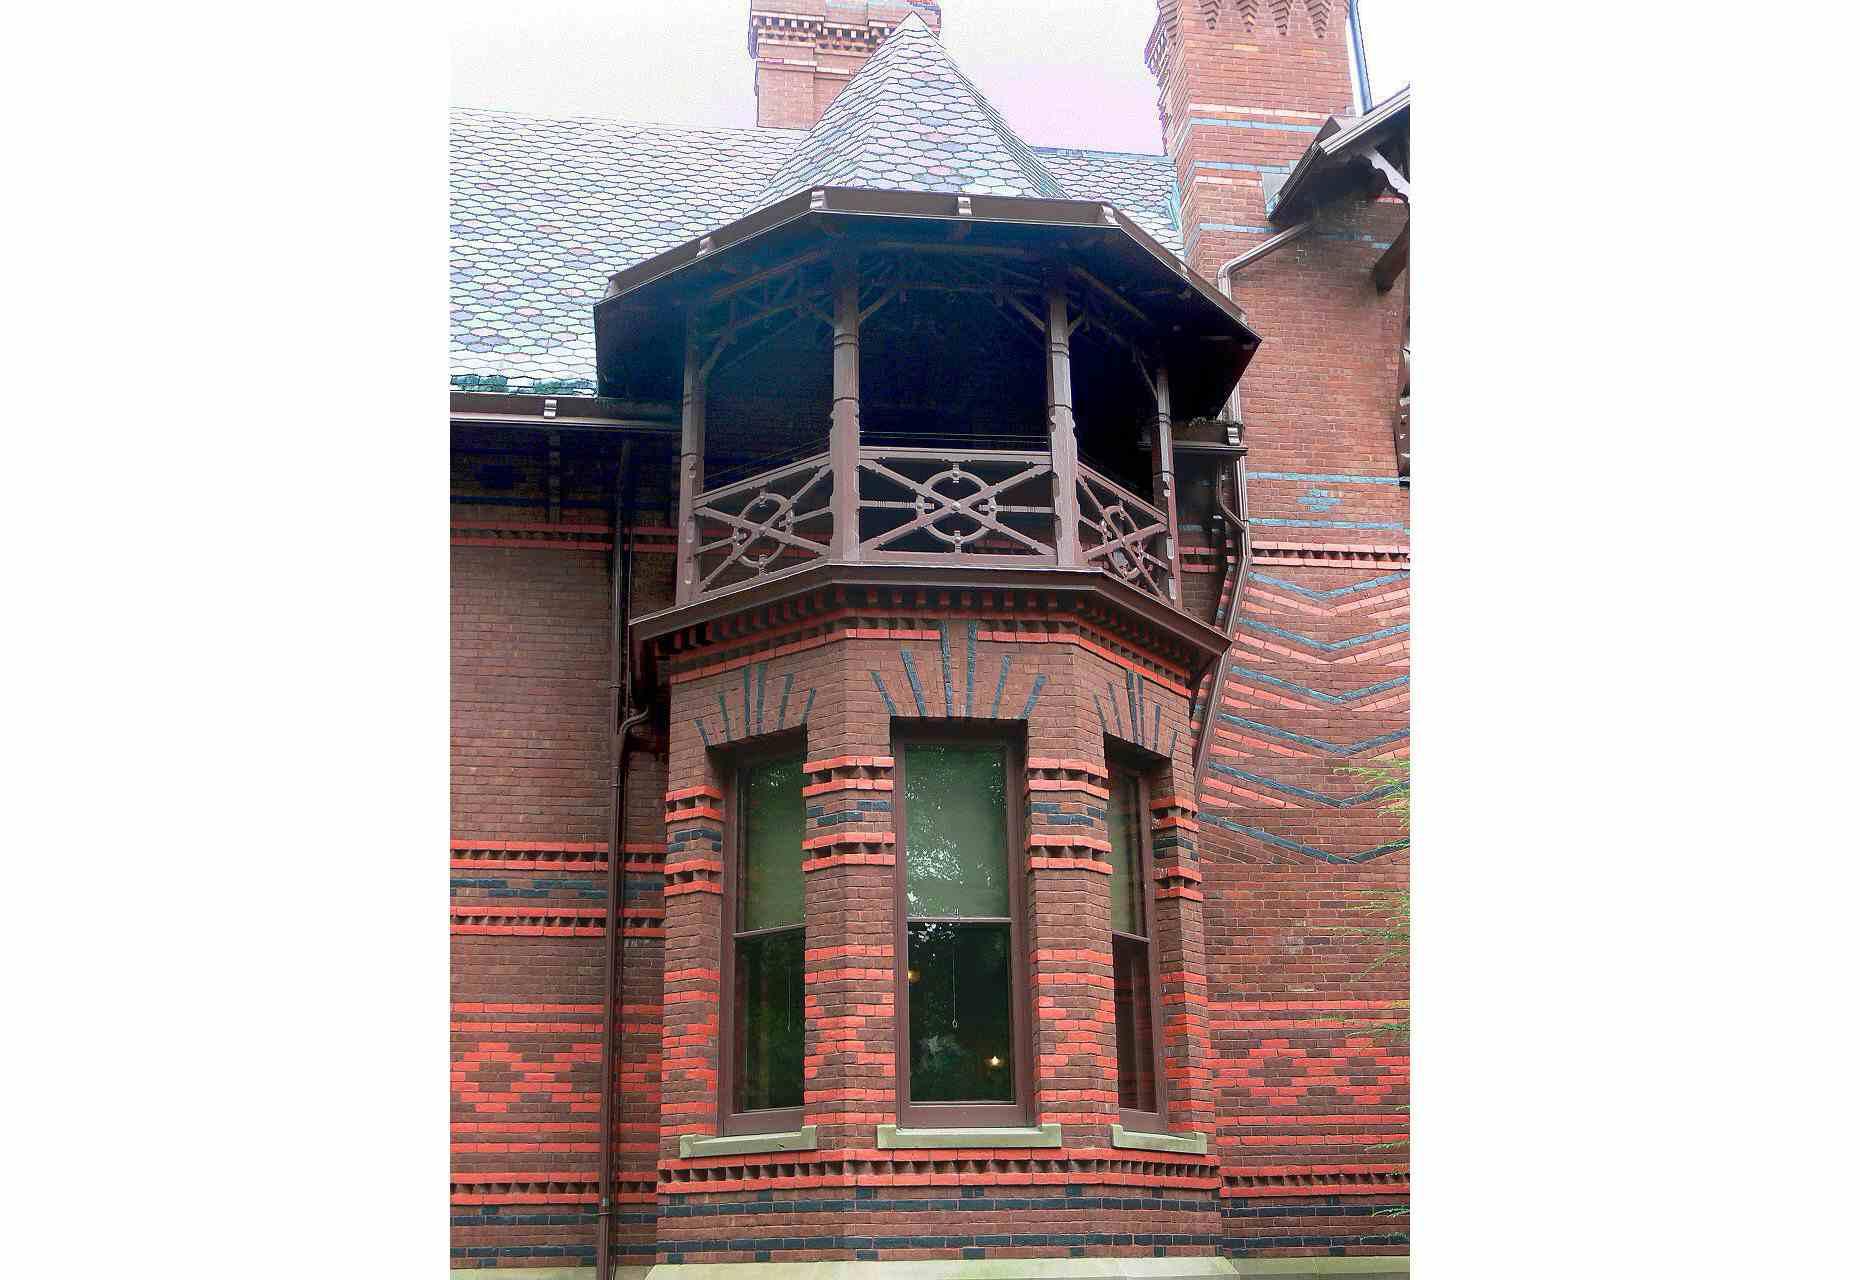 Turrets and bay windows give the Mark Twain House a complicated, asymmetrical shape